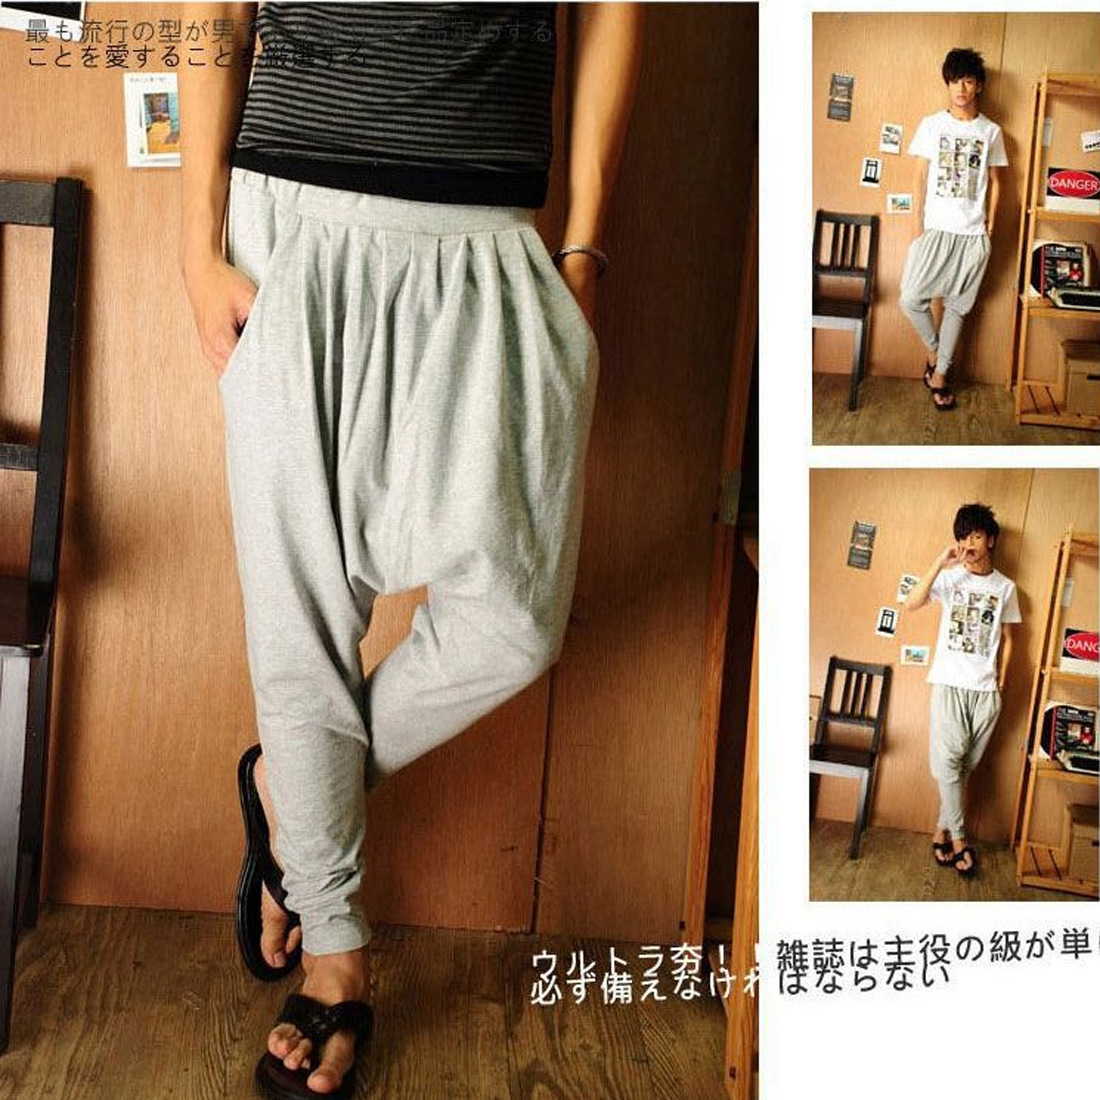 Purchasing Agents AliExpress Men Harem Pants Japanese Korean For Both Men And Women Saggy Pants Harem Pants K008